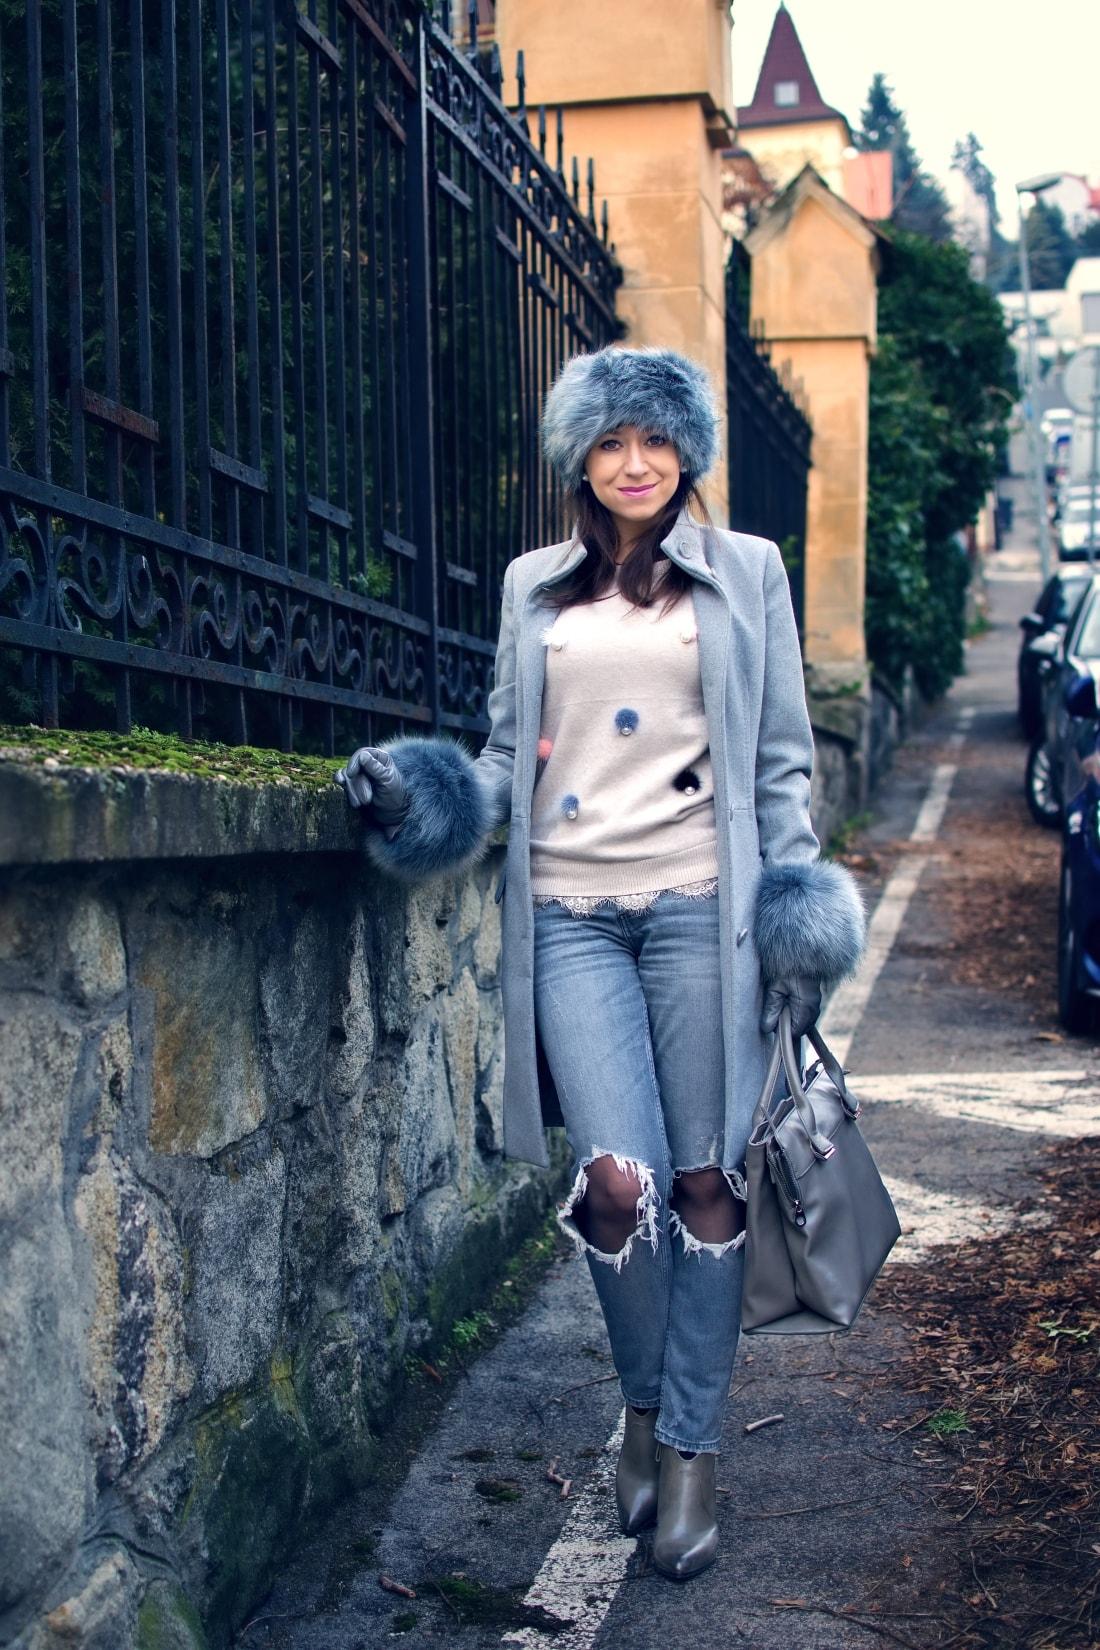 Kožušinové doplnky_Katharine-fashion is beautiful_blog 6_Sivý kabát_Roztrhané džínsy Zara_Katarína Jakubčová_Fashion blogger